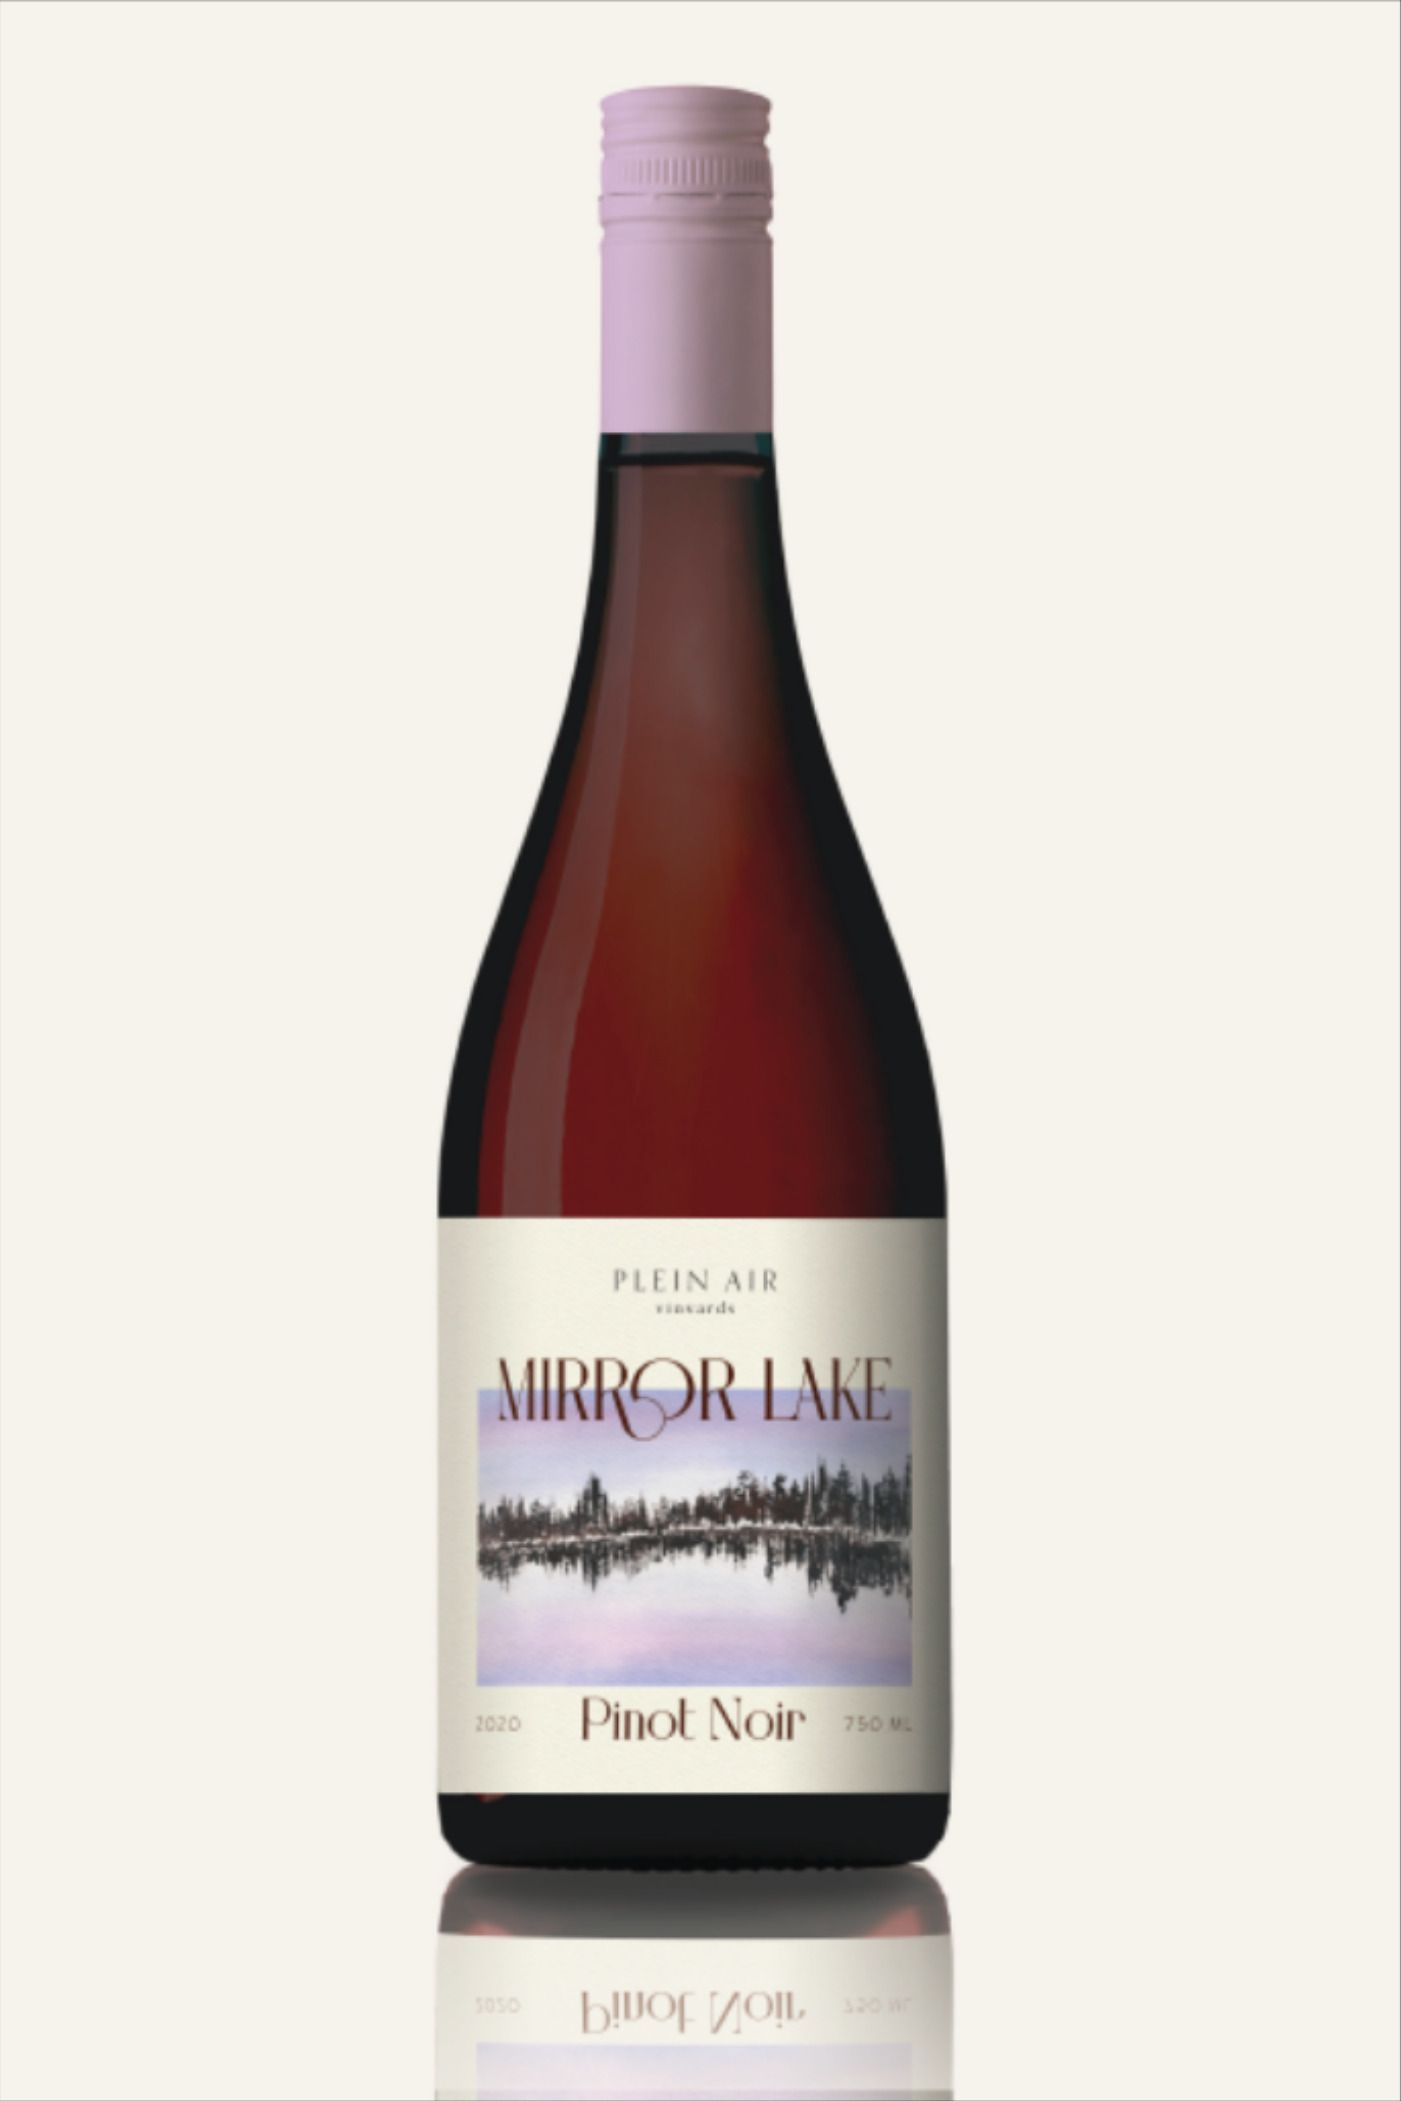 Pinot Noir Label Design And Branding For Outdoor Inspired Wine Brand In 2020 Wine Bottle Label Design Label Design Wine Brands